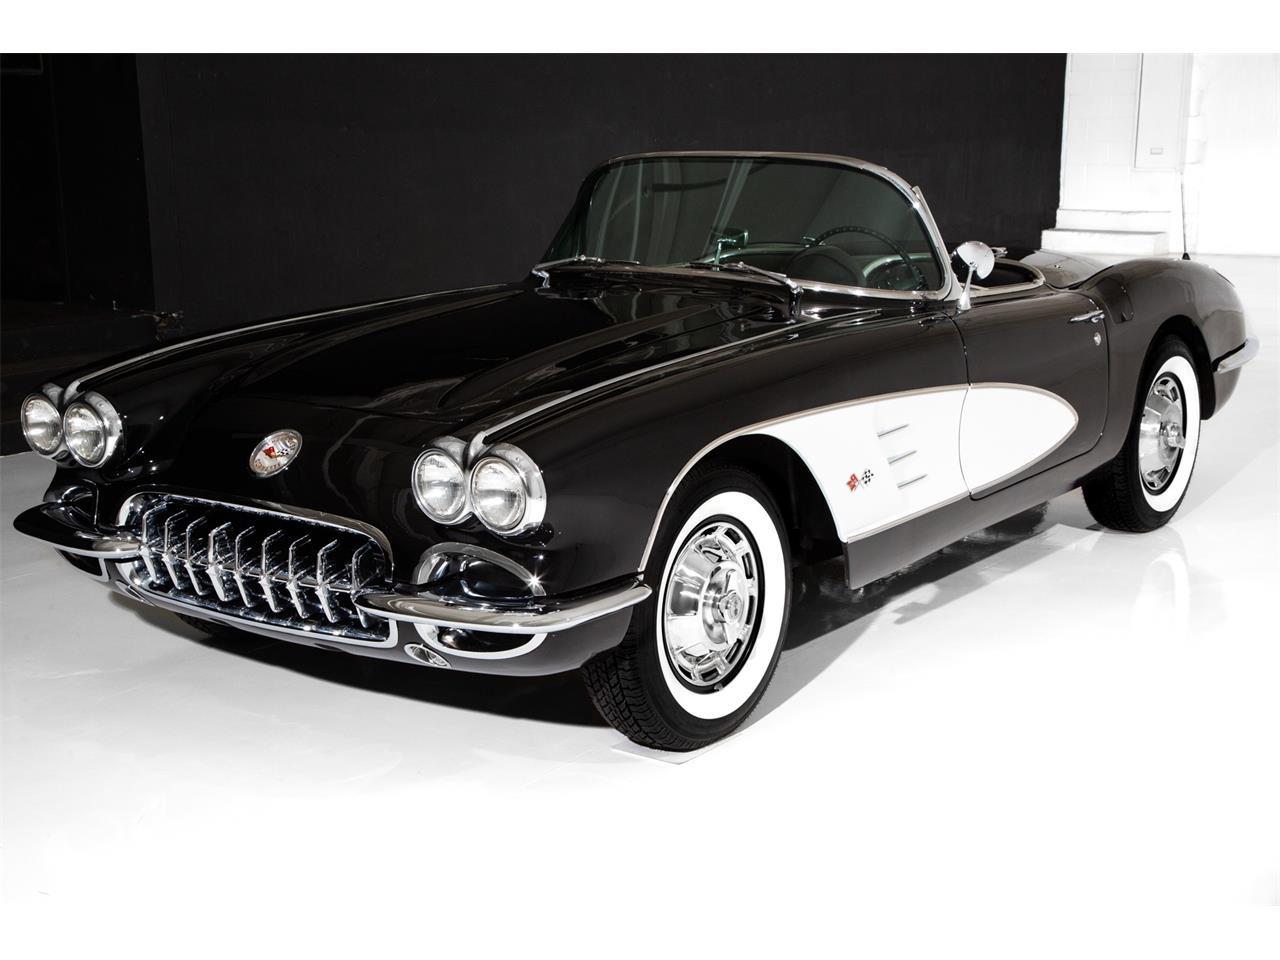 1959 Chevrolet Corvette (CC-1356176) for sale in Des Moines, Iowa